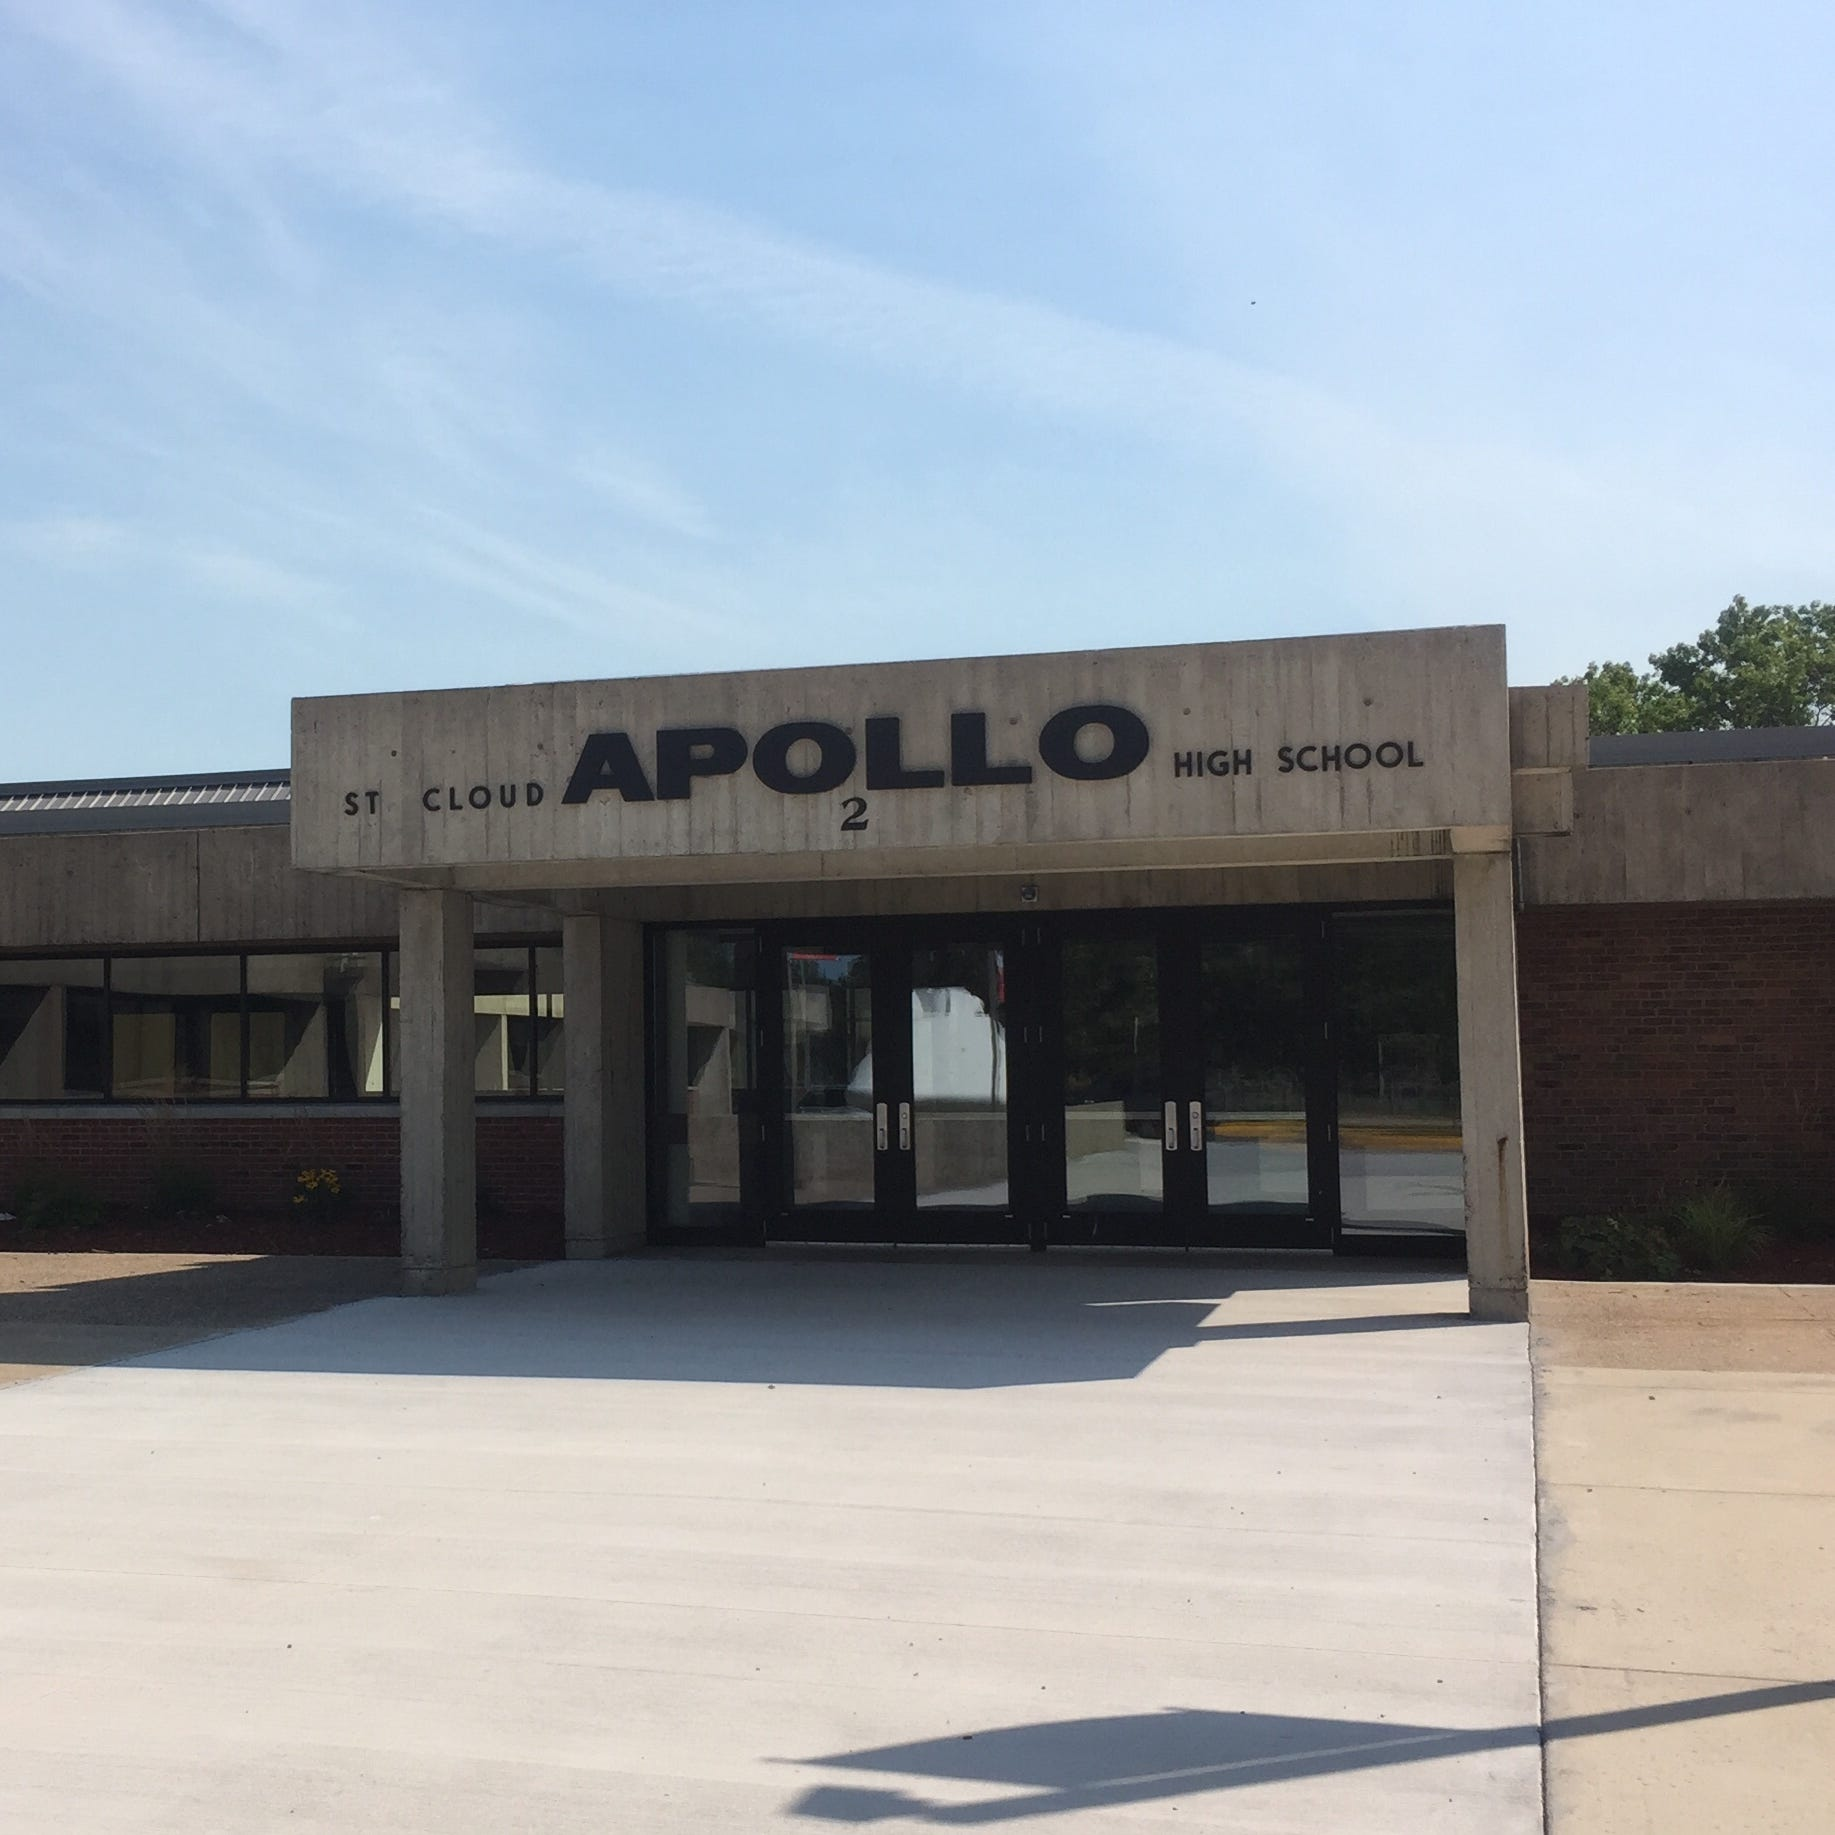 St. Cloud school board eyes 2020 referendum for Apollo remodel